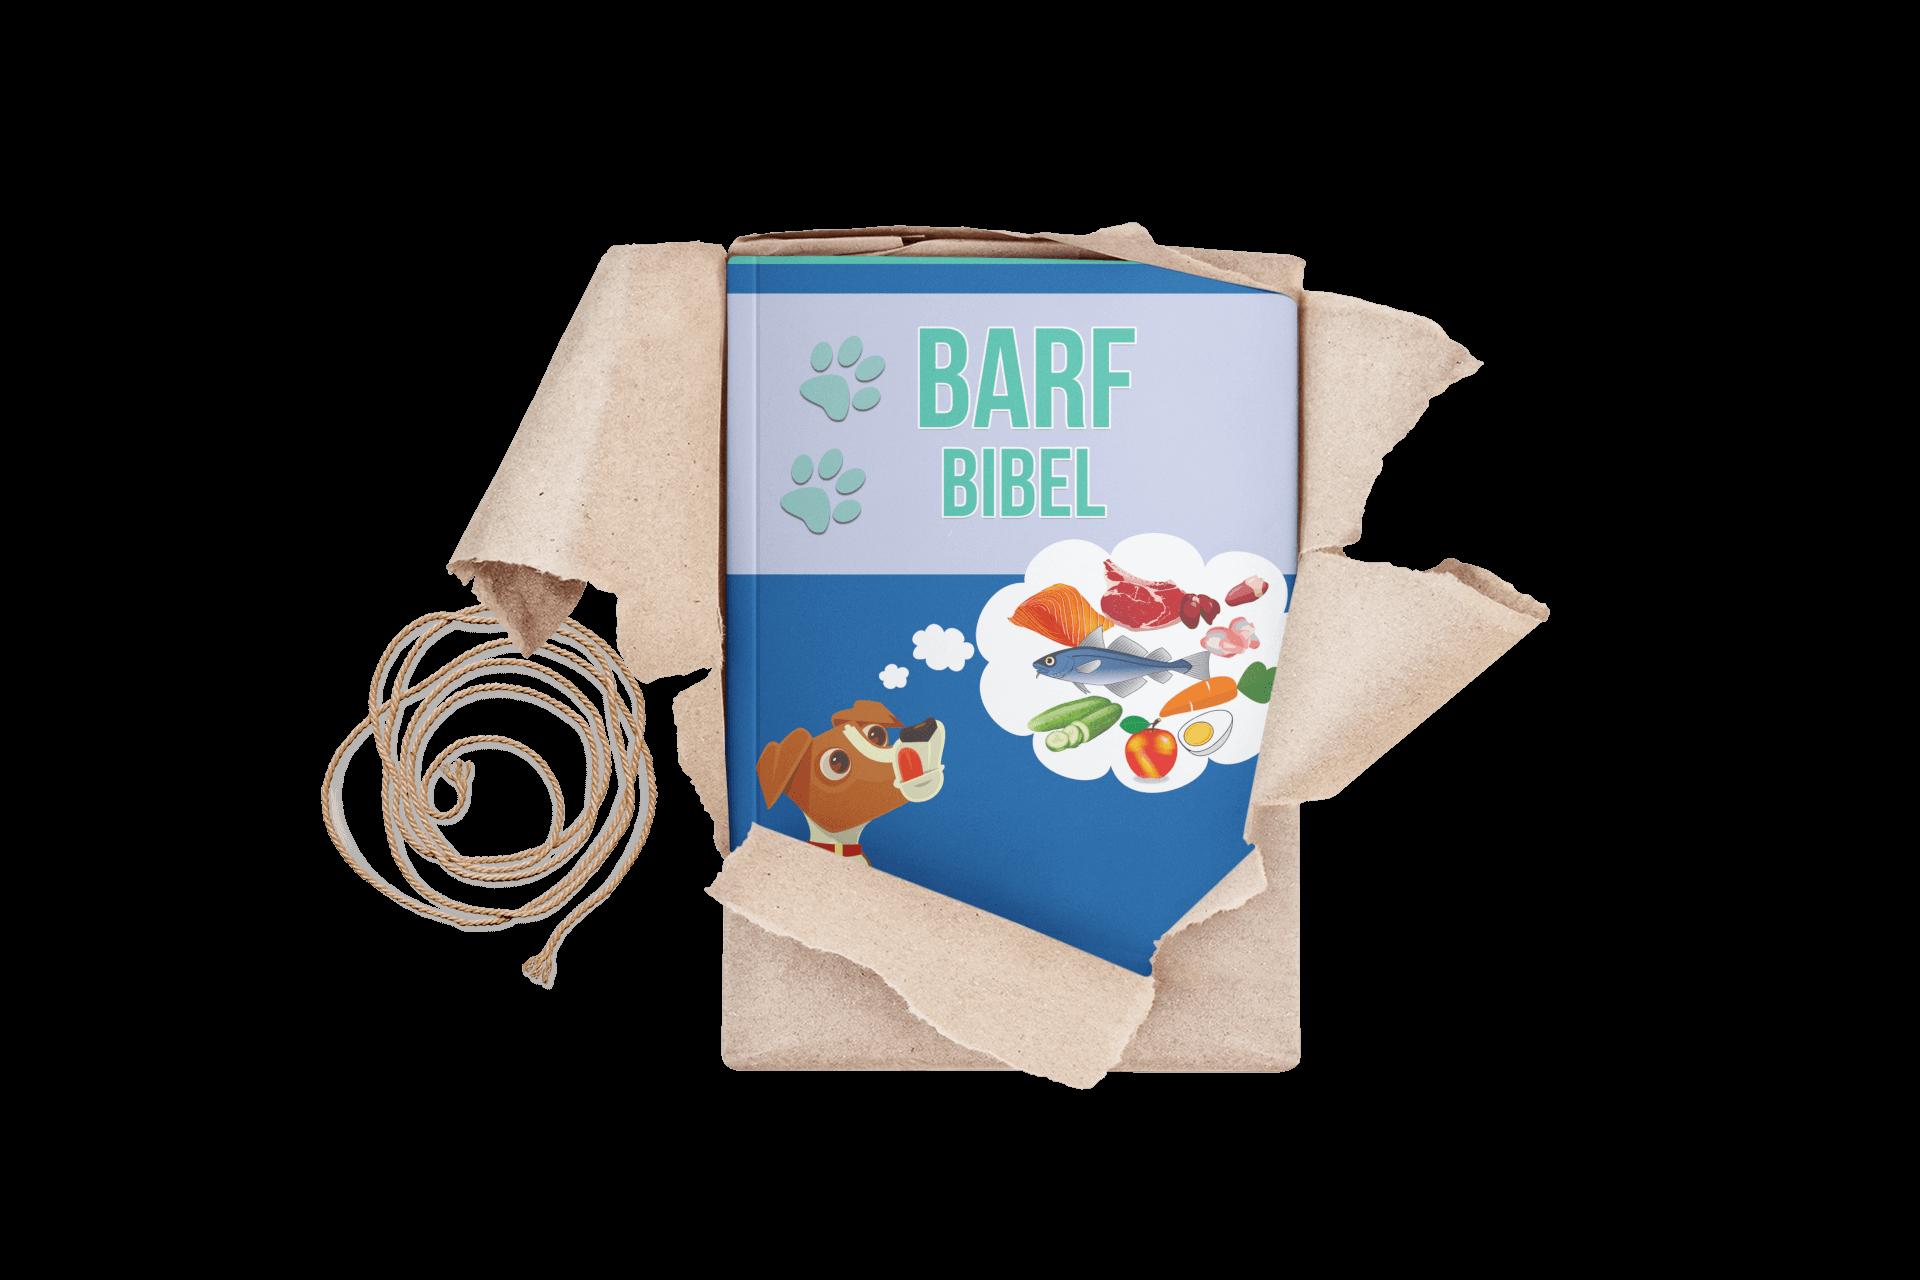 Barf Bibel Partnerprogramm 10